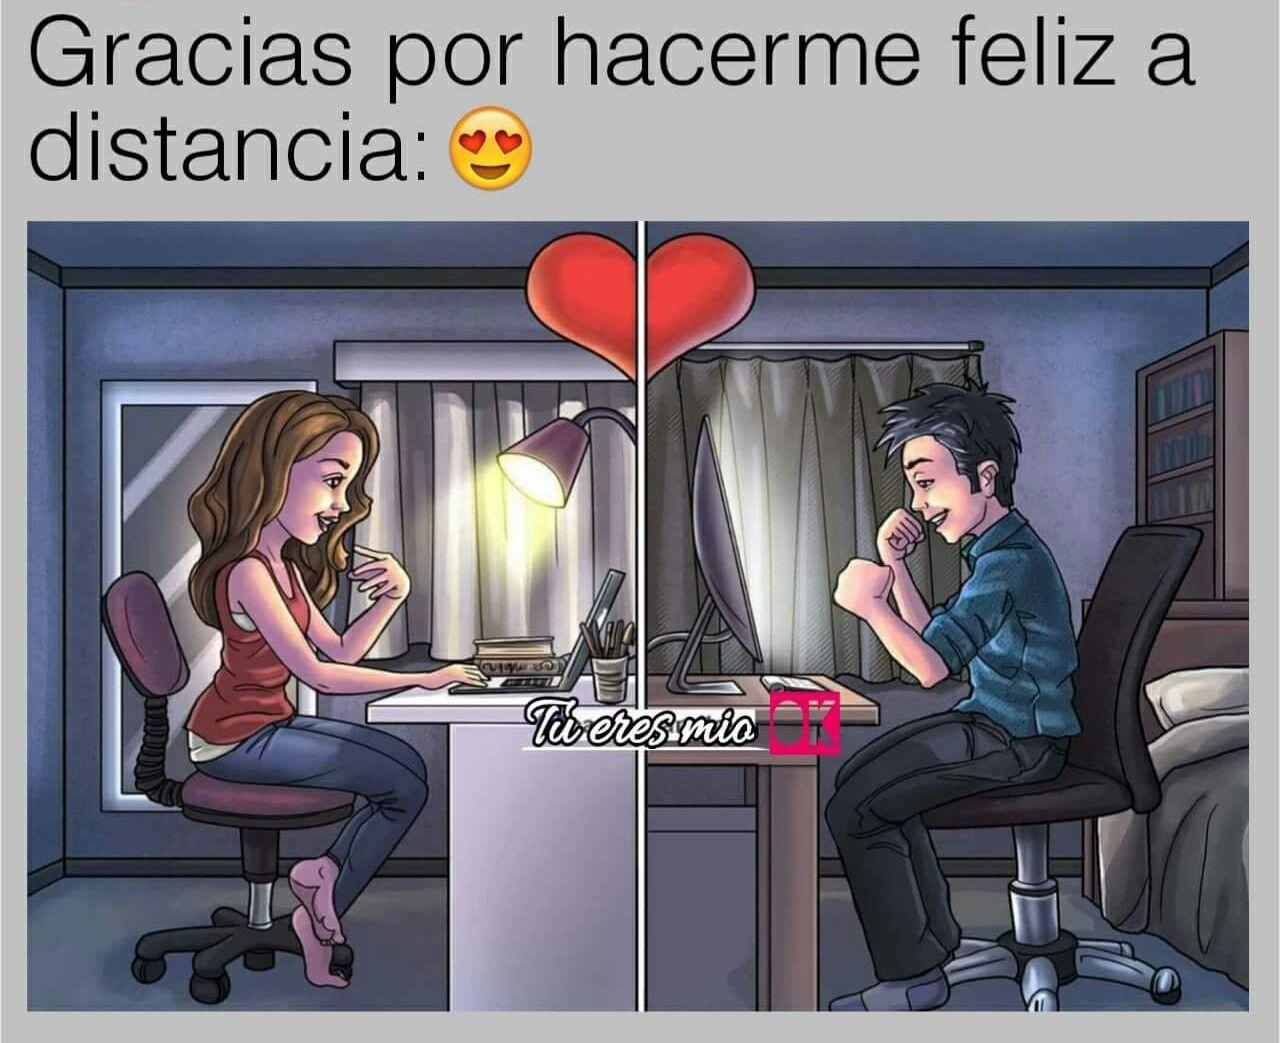 Muchisimas Gracias Mi Amor Amor A Distancia Citas De Relacion A Distancia Relaciones A Larga Distancia